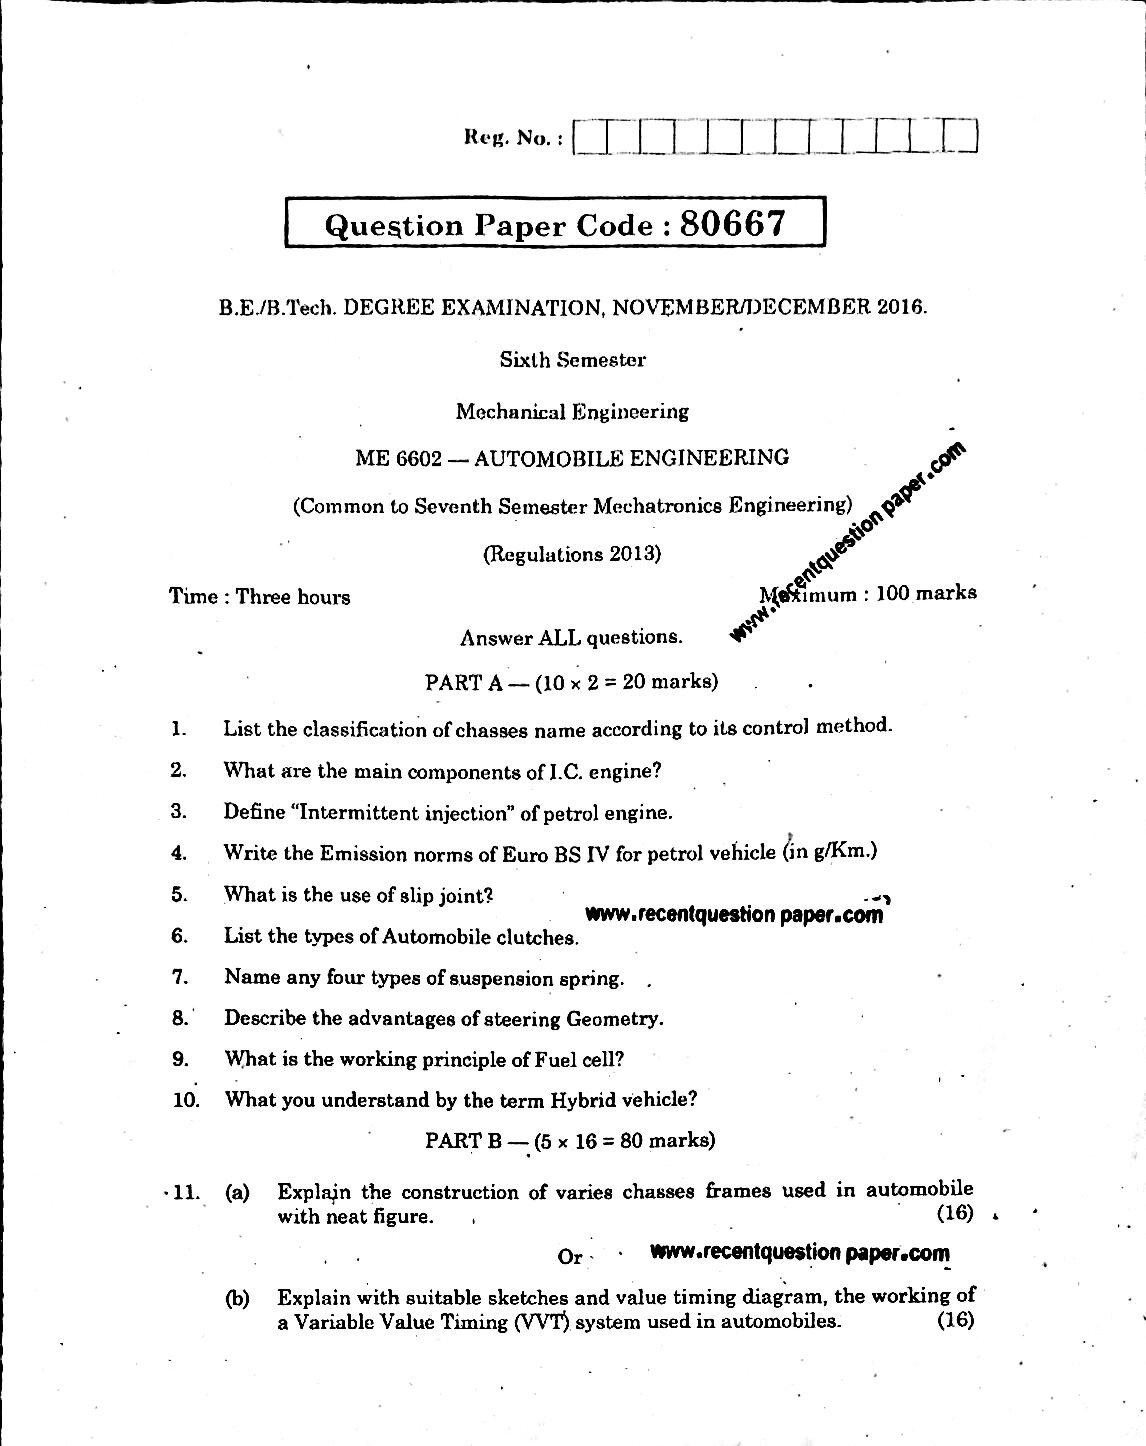 ME6602 Automobile Engineering Anna University Question paper Nov/Dec 2016